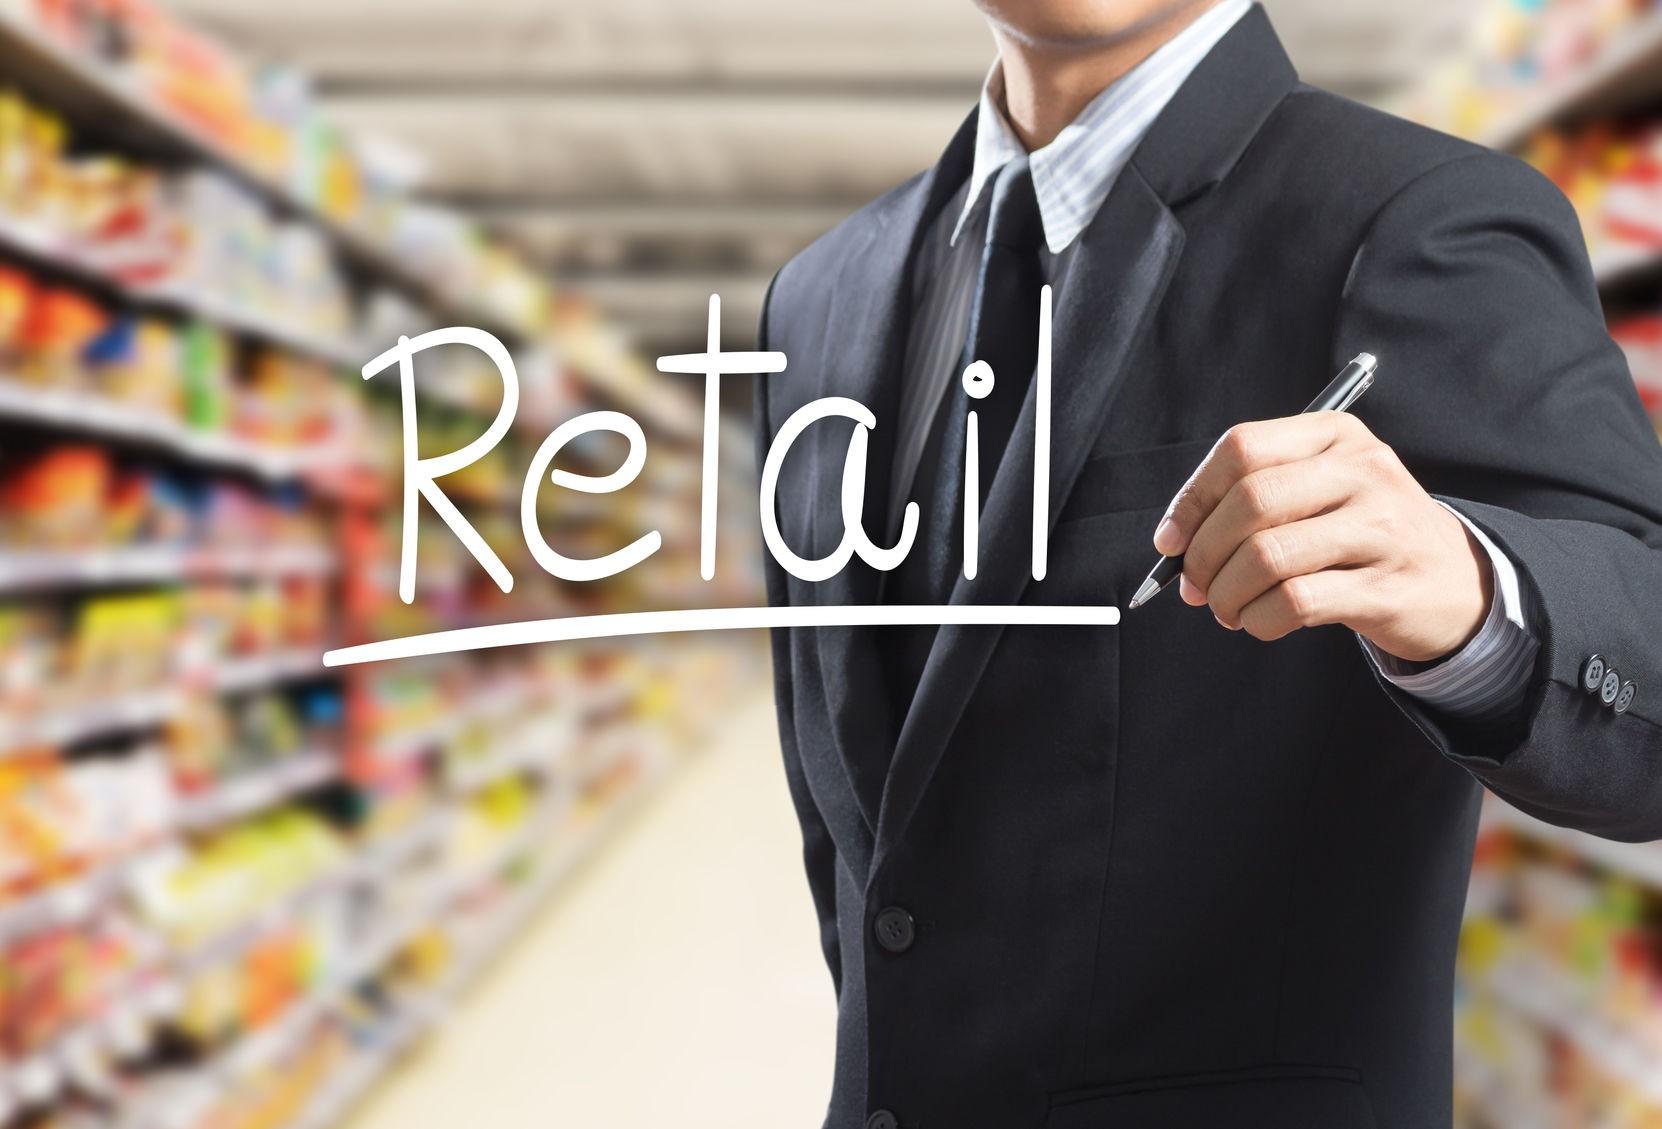 The Retail Network   LinkedIn